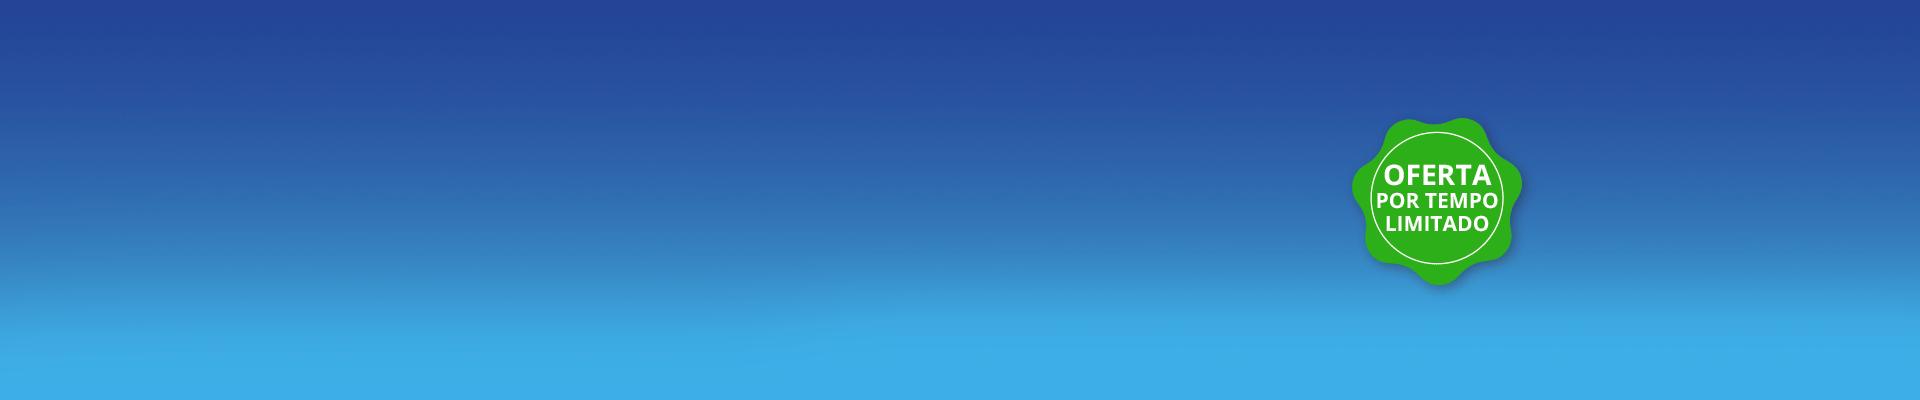 Banner Construtor de sites Novo – Desktop